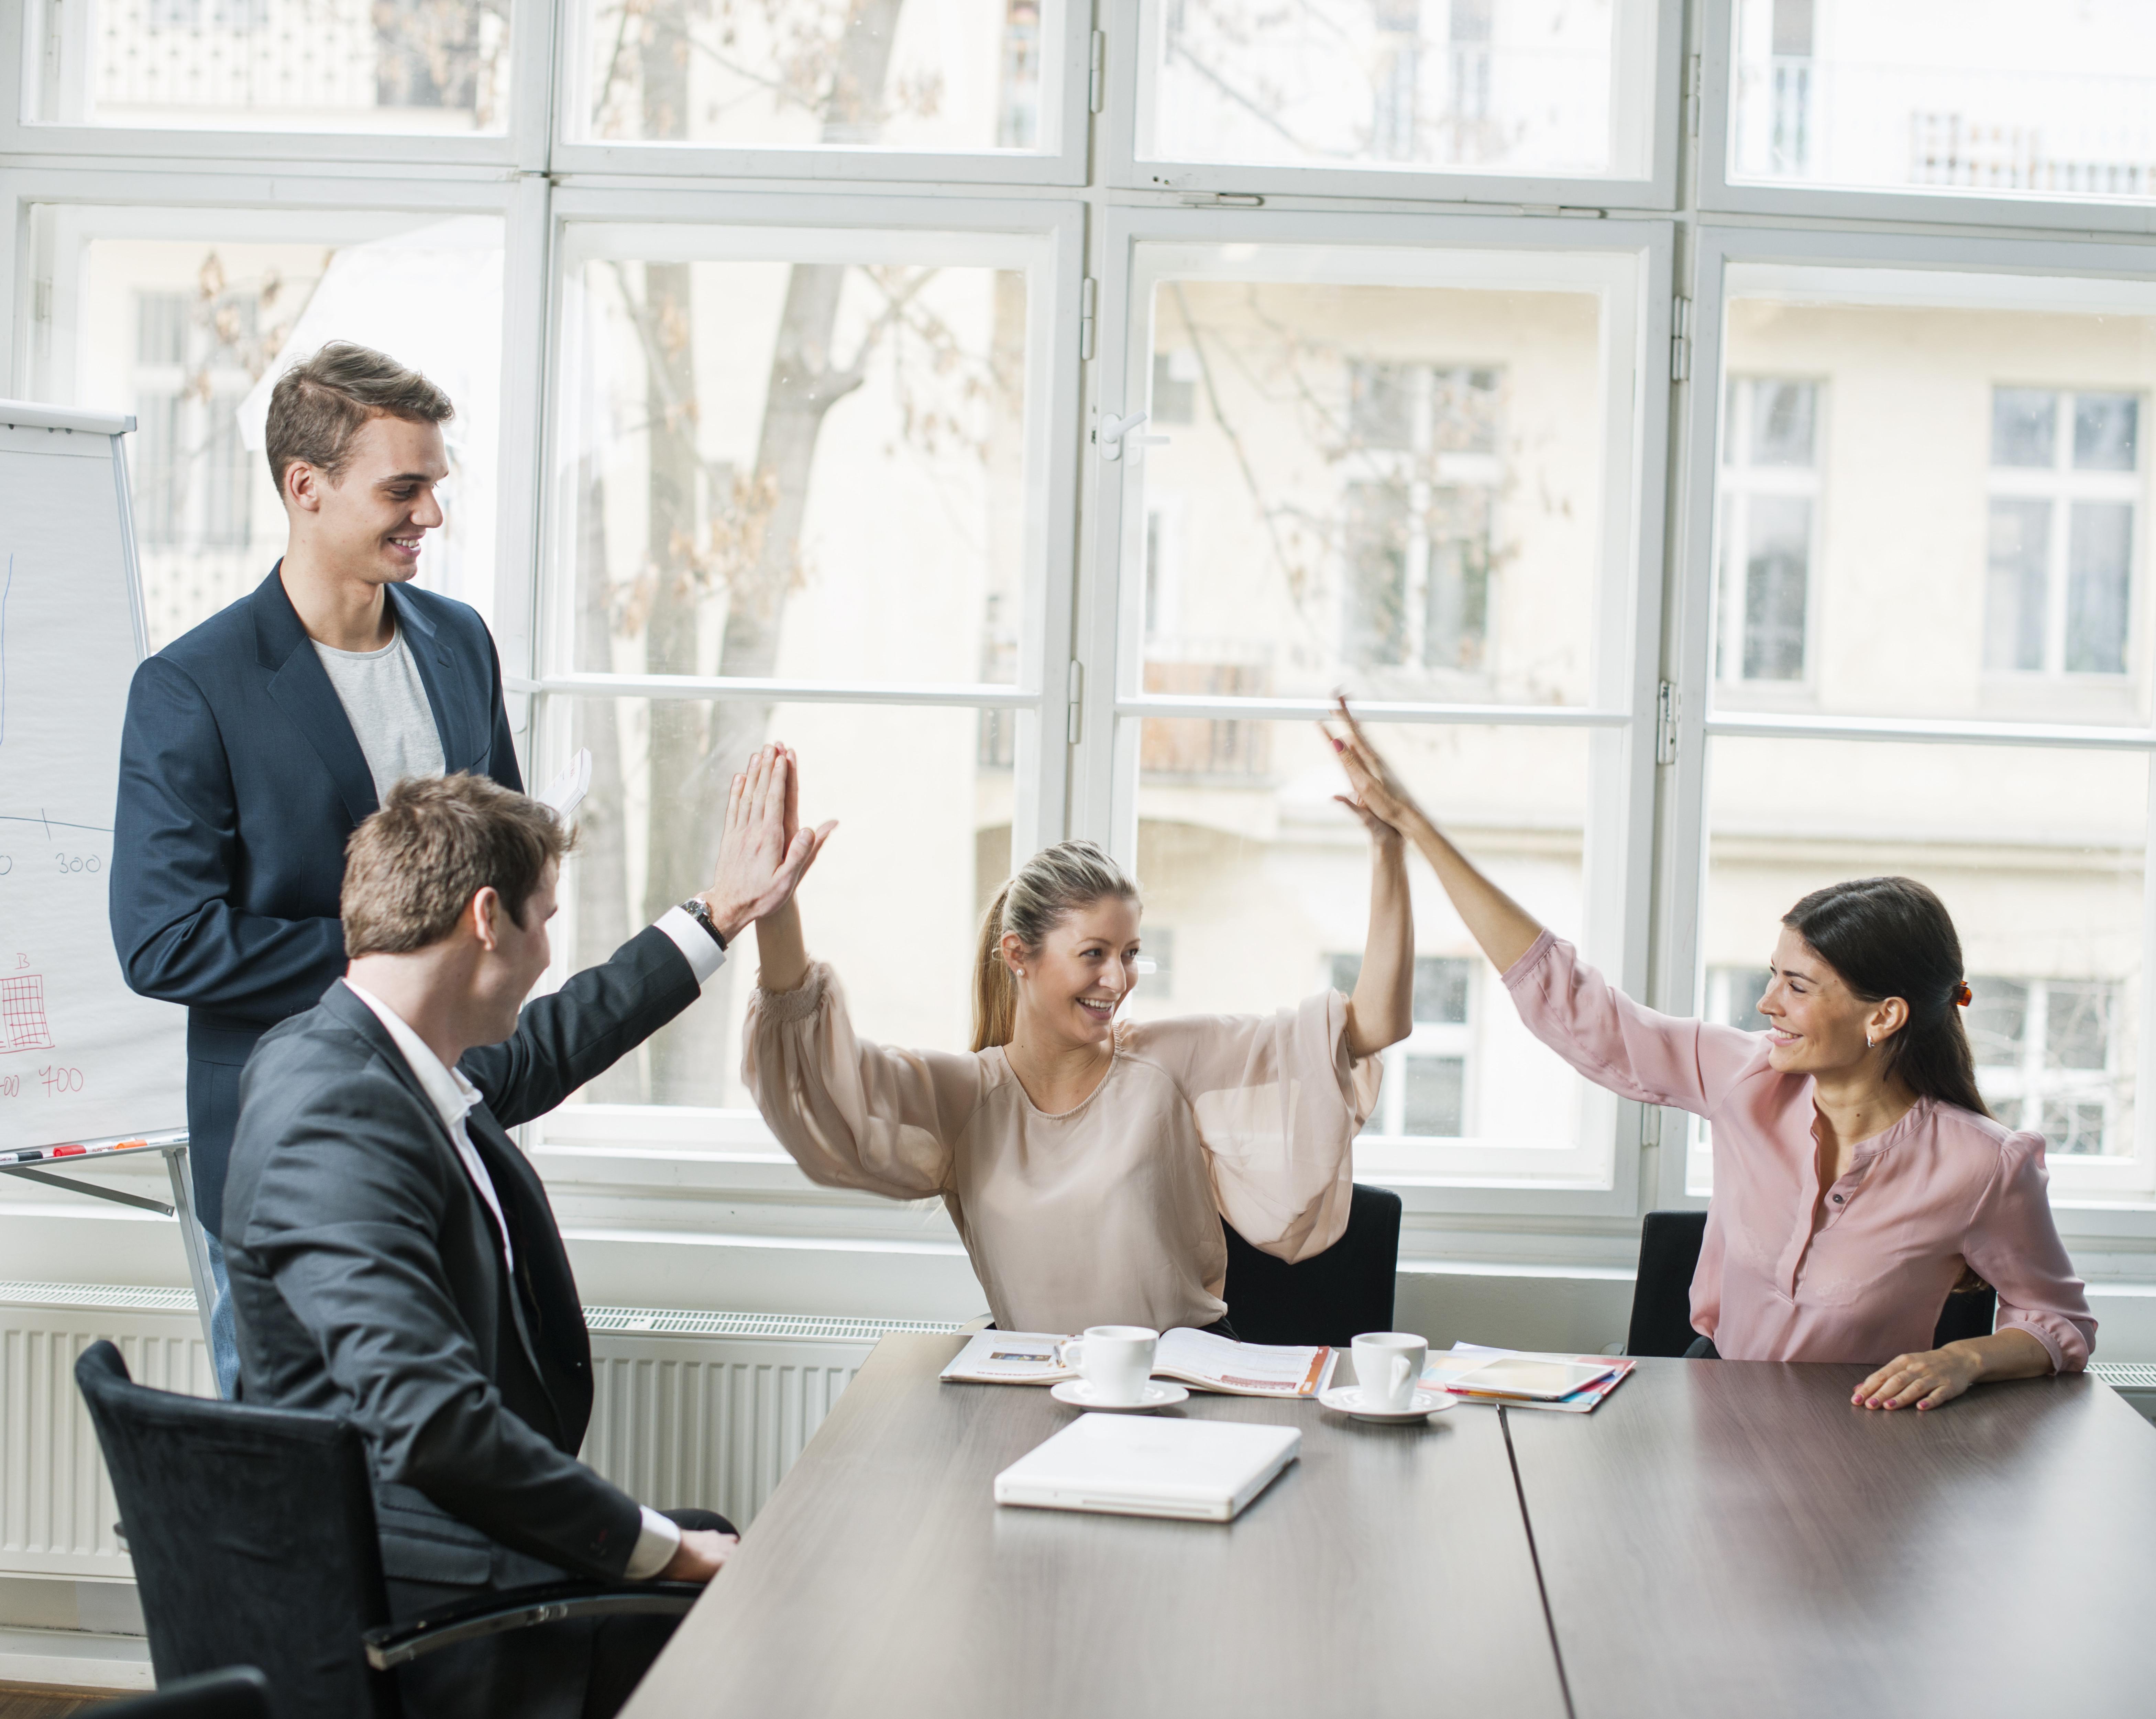 Business Team Doing High Five Meeting Icebreakers